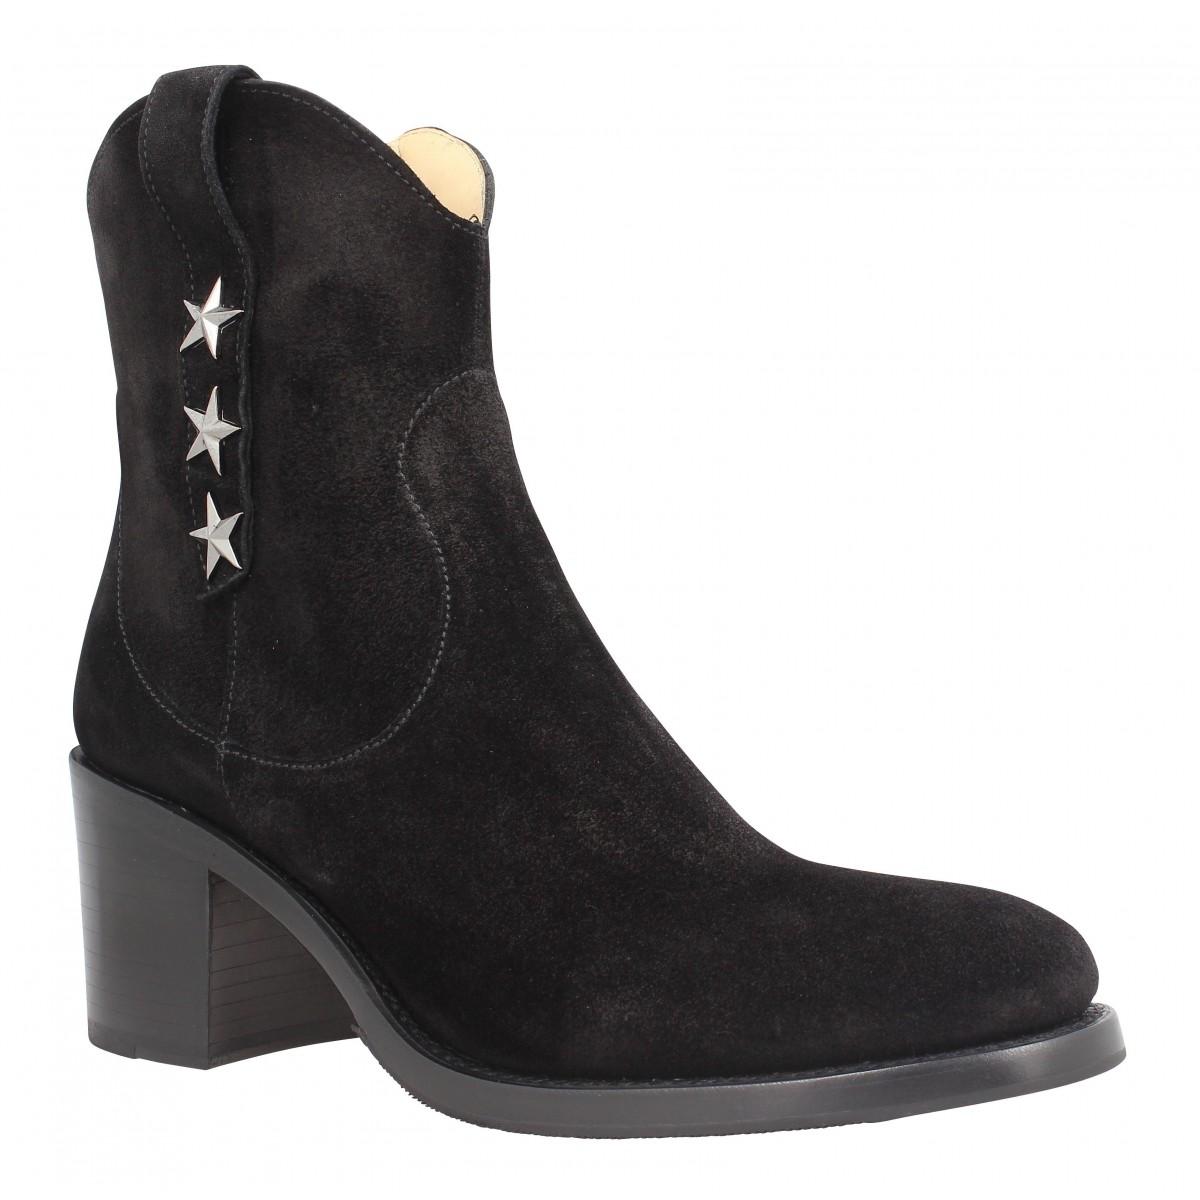 Bottes FREE LANCE Mansory 7 West Zip Boot velours Femme Noir